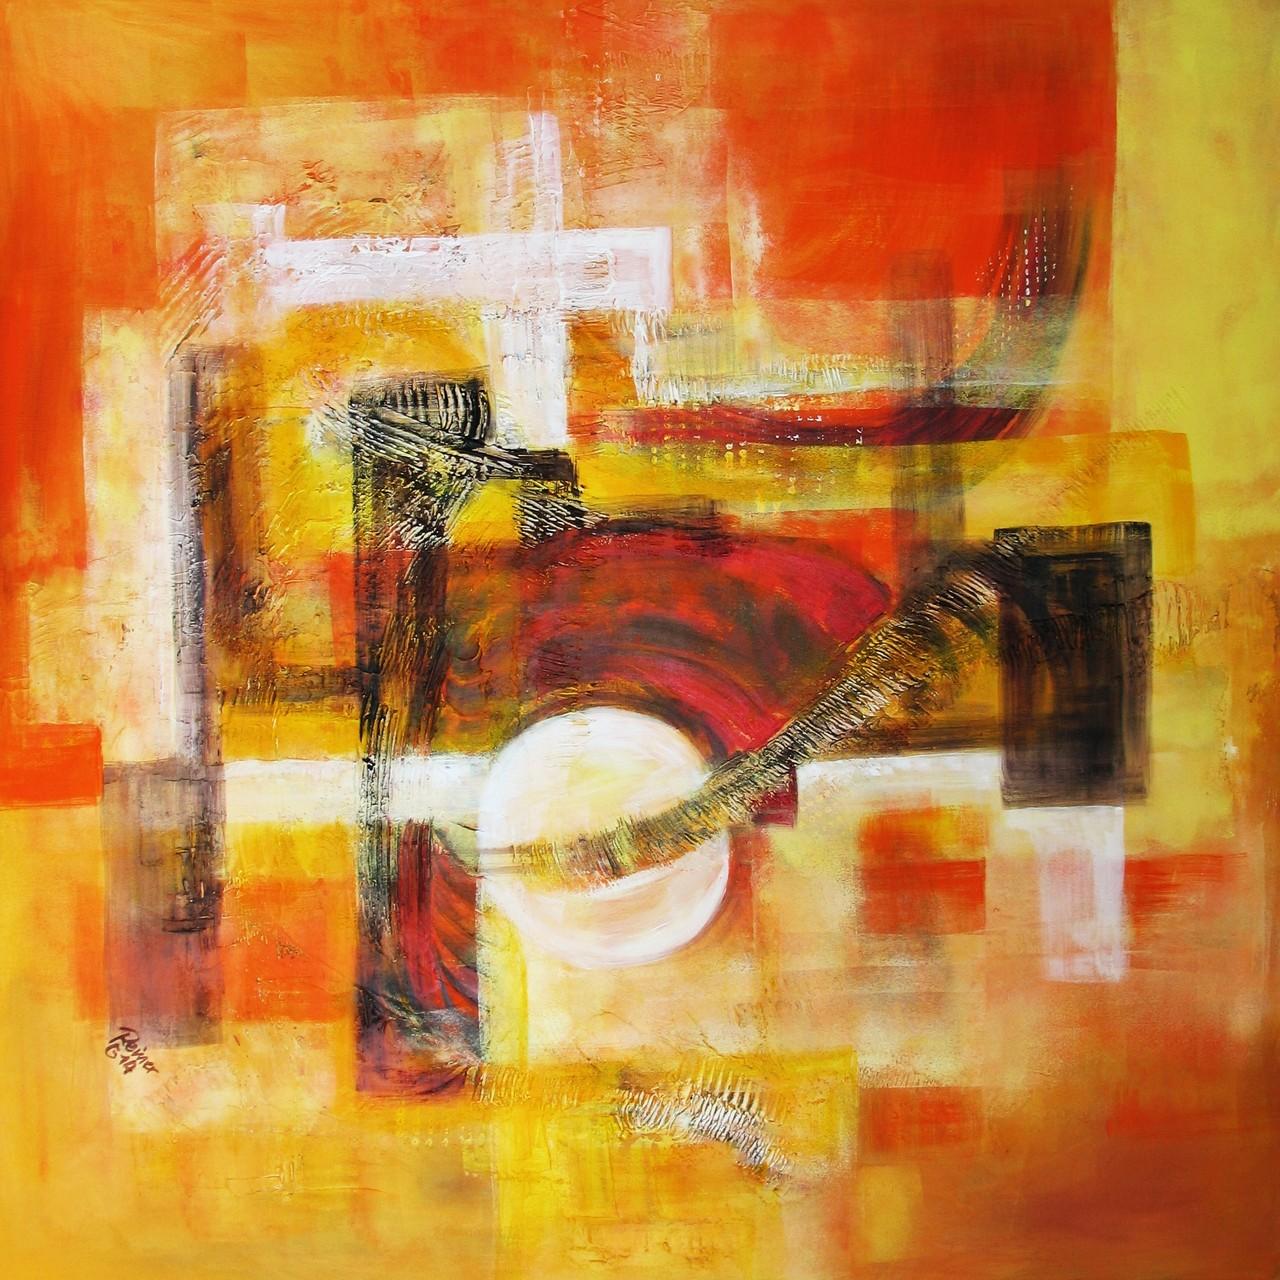 Westwärts, Acryl, Strukturpaste auf Leinwand, 80 x 80 cm